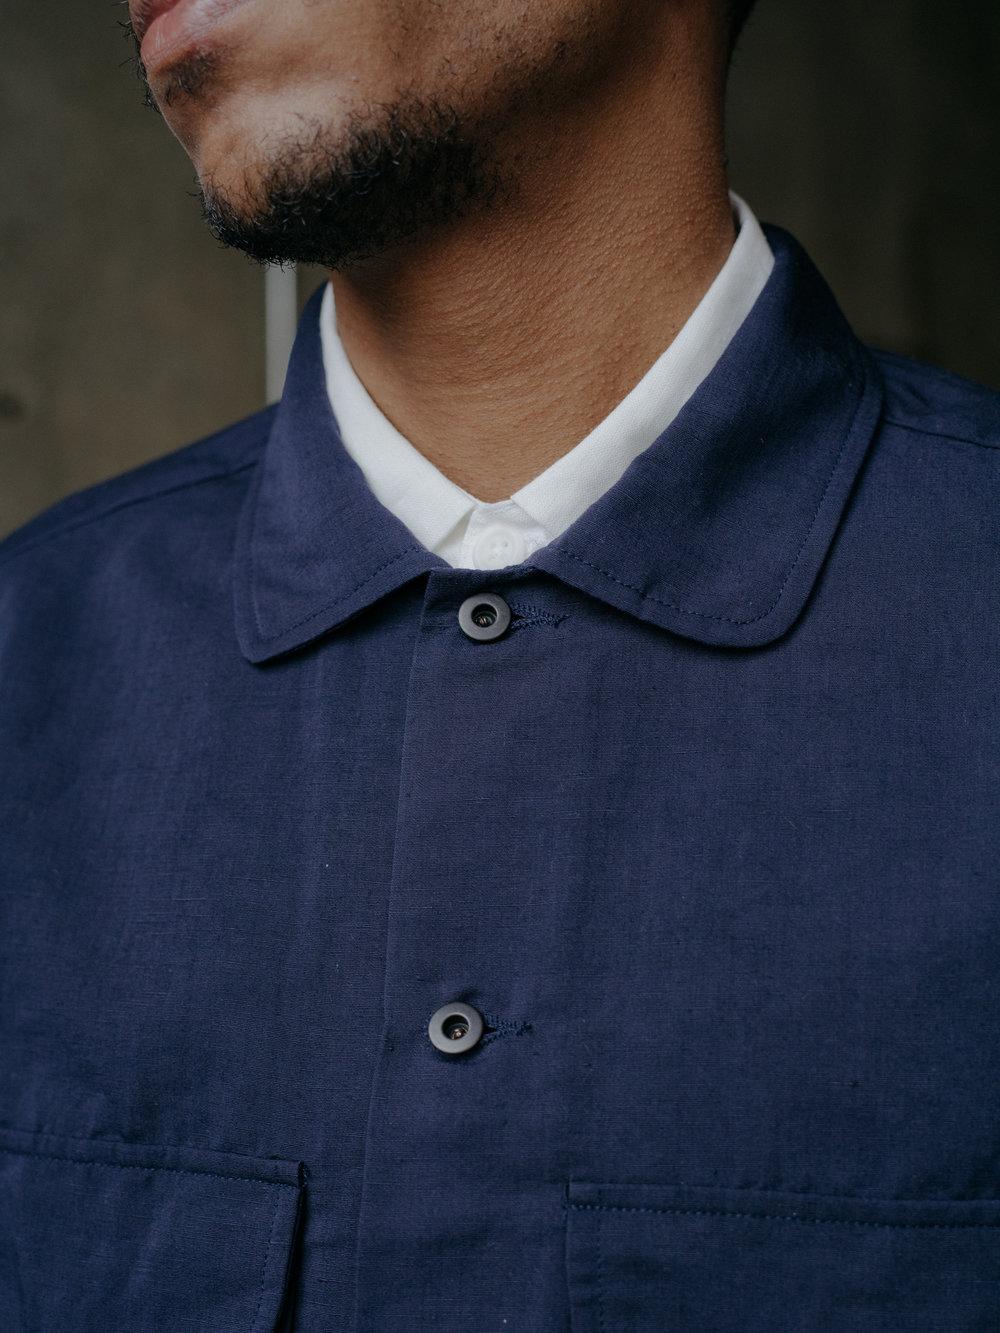 evan-kinori-field-shirt-nylon-linen-5